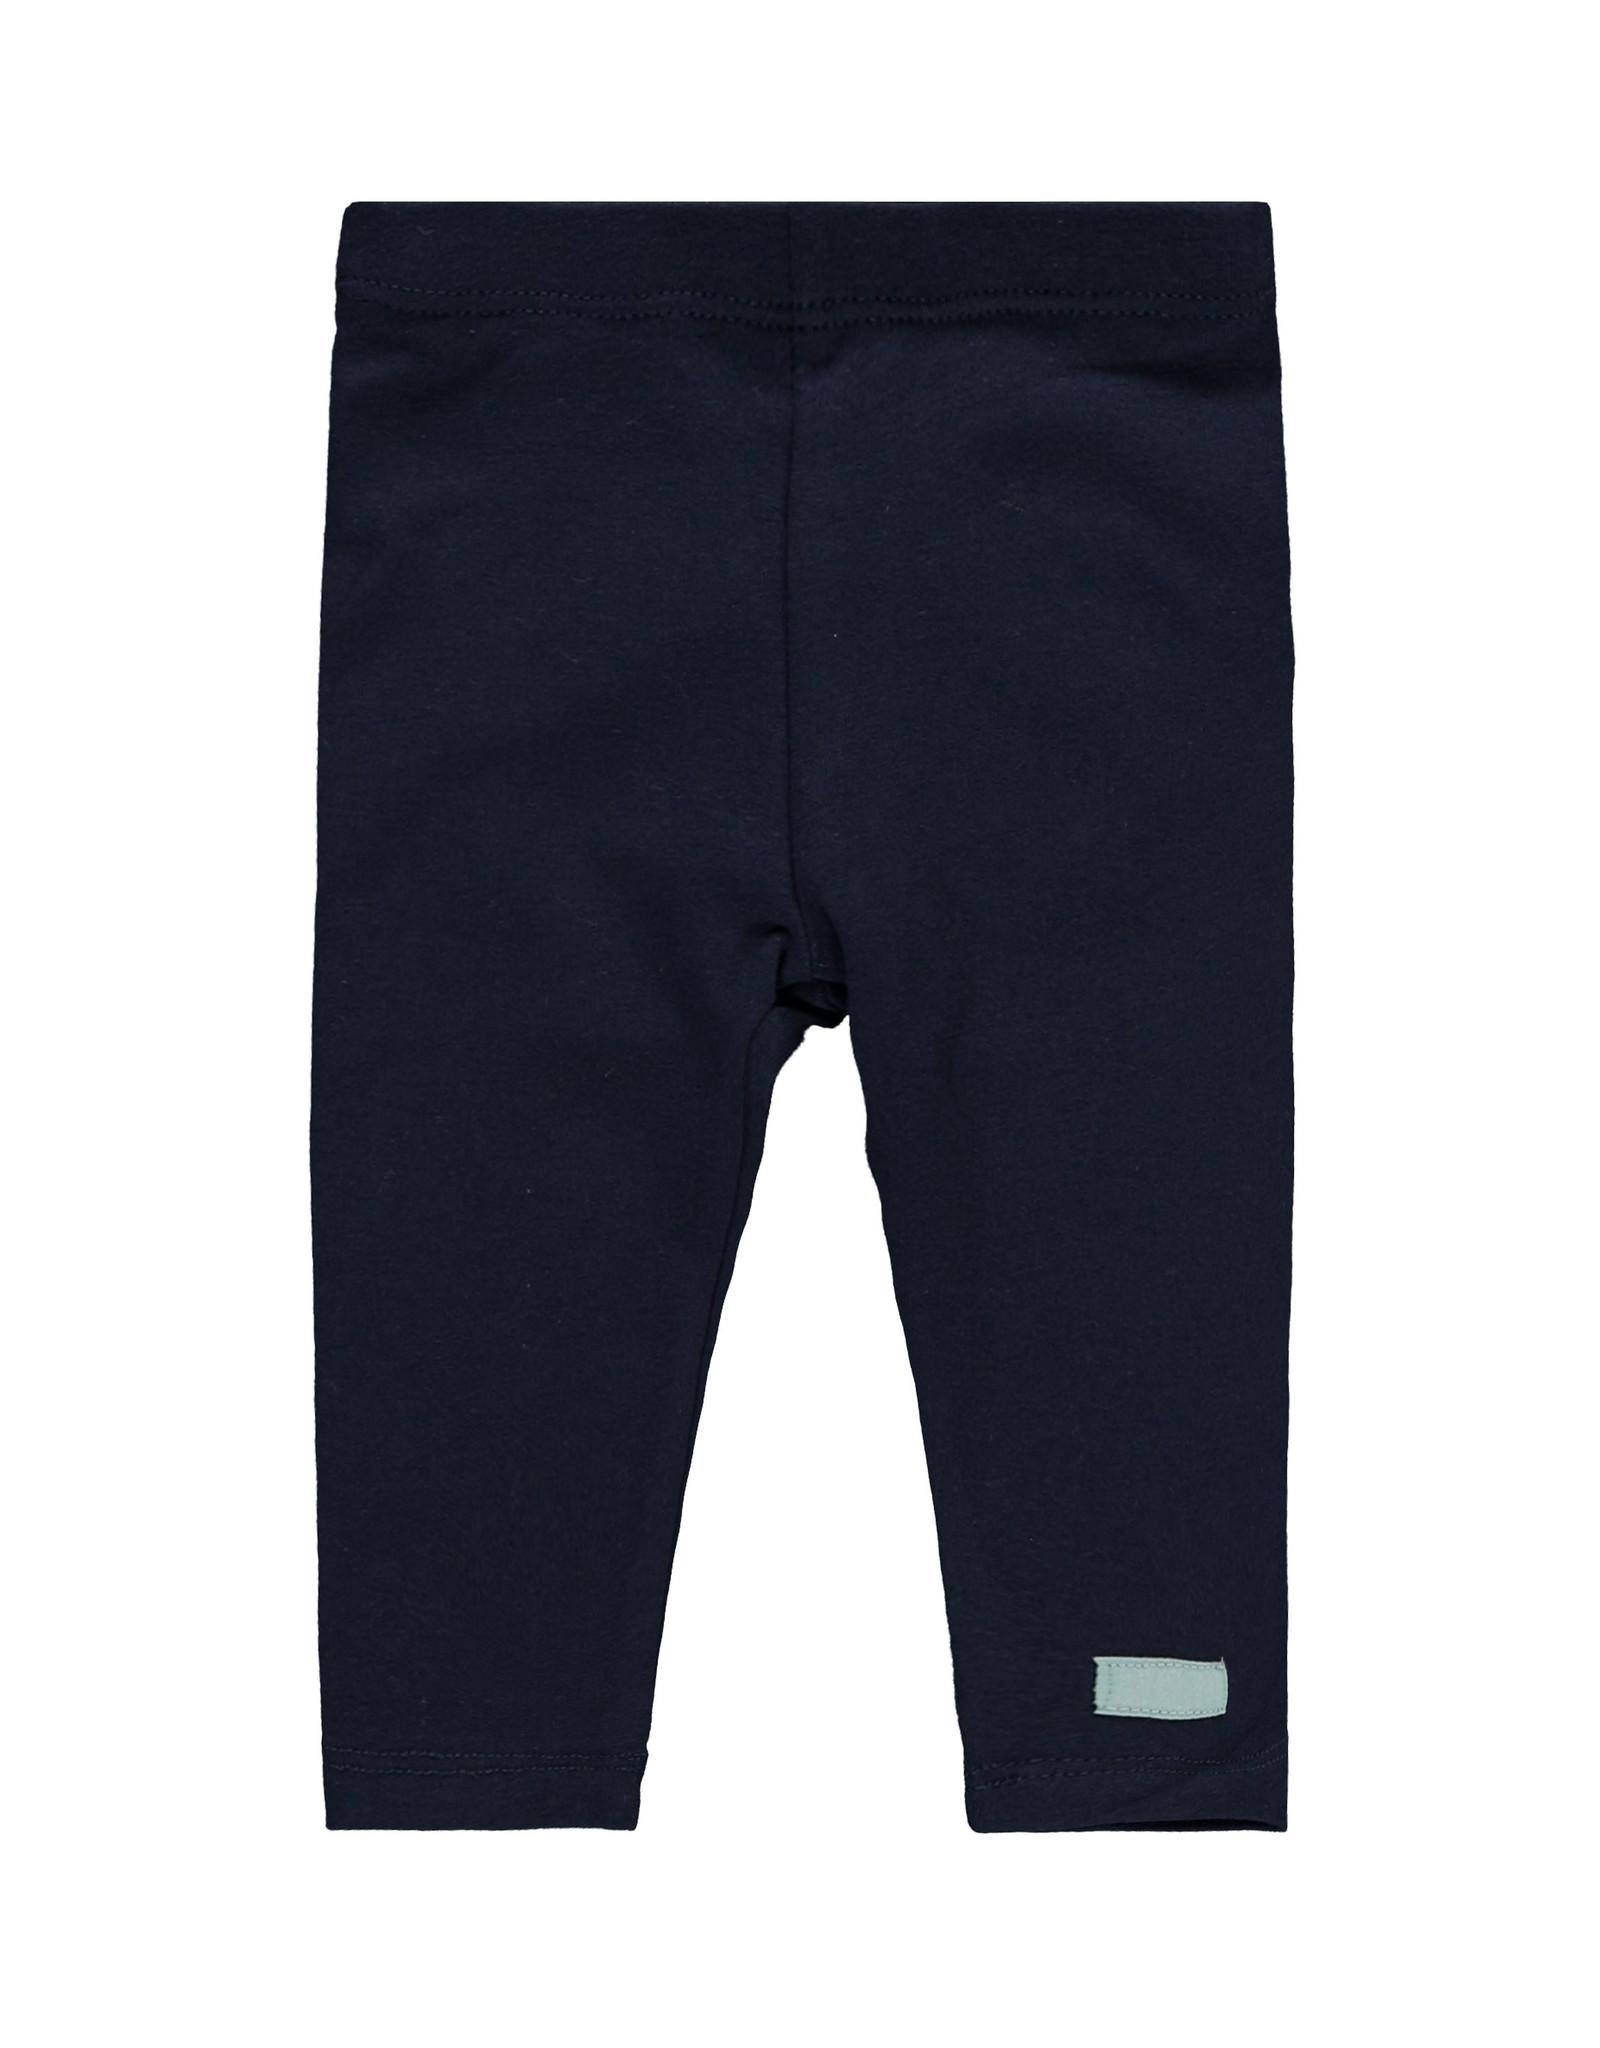 Bampidano New Born legging plain, navy